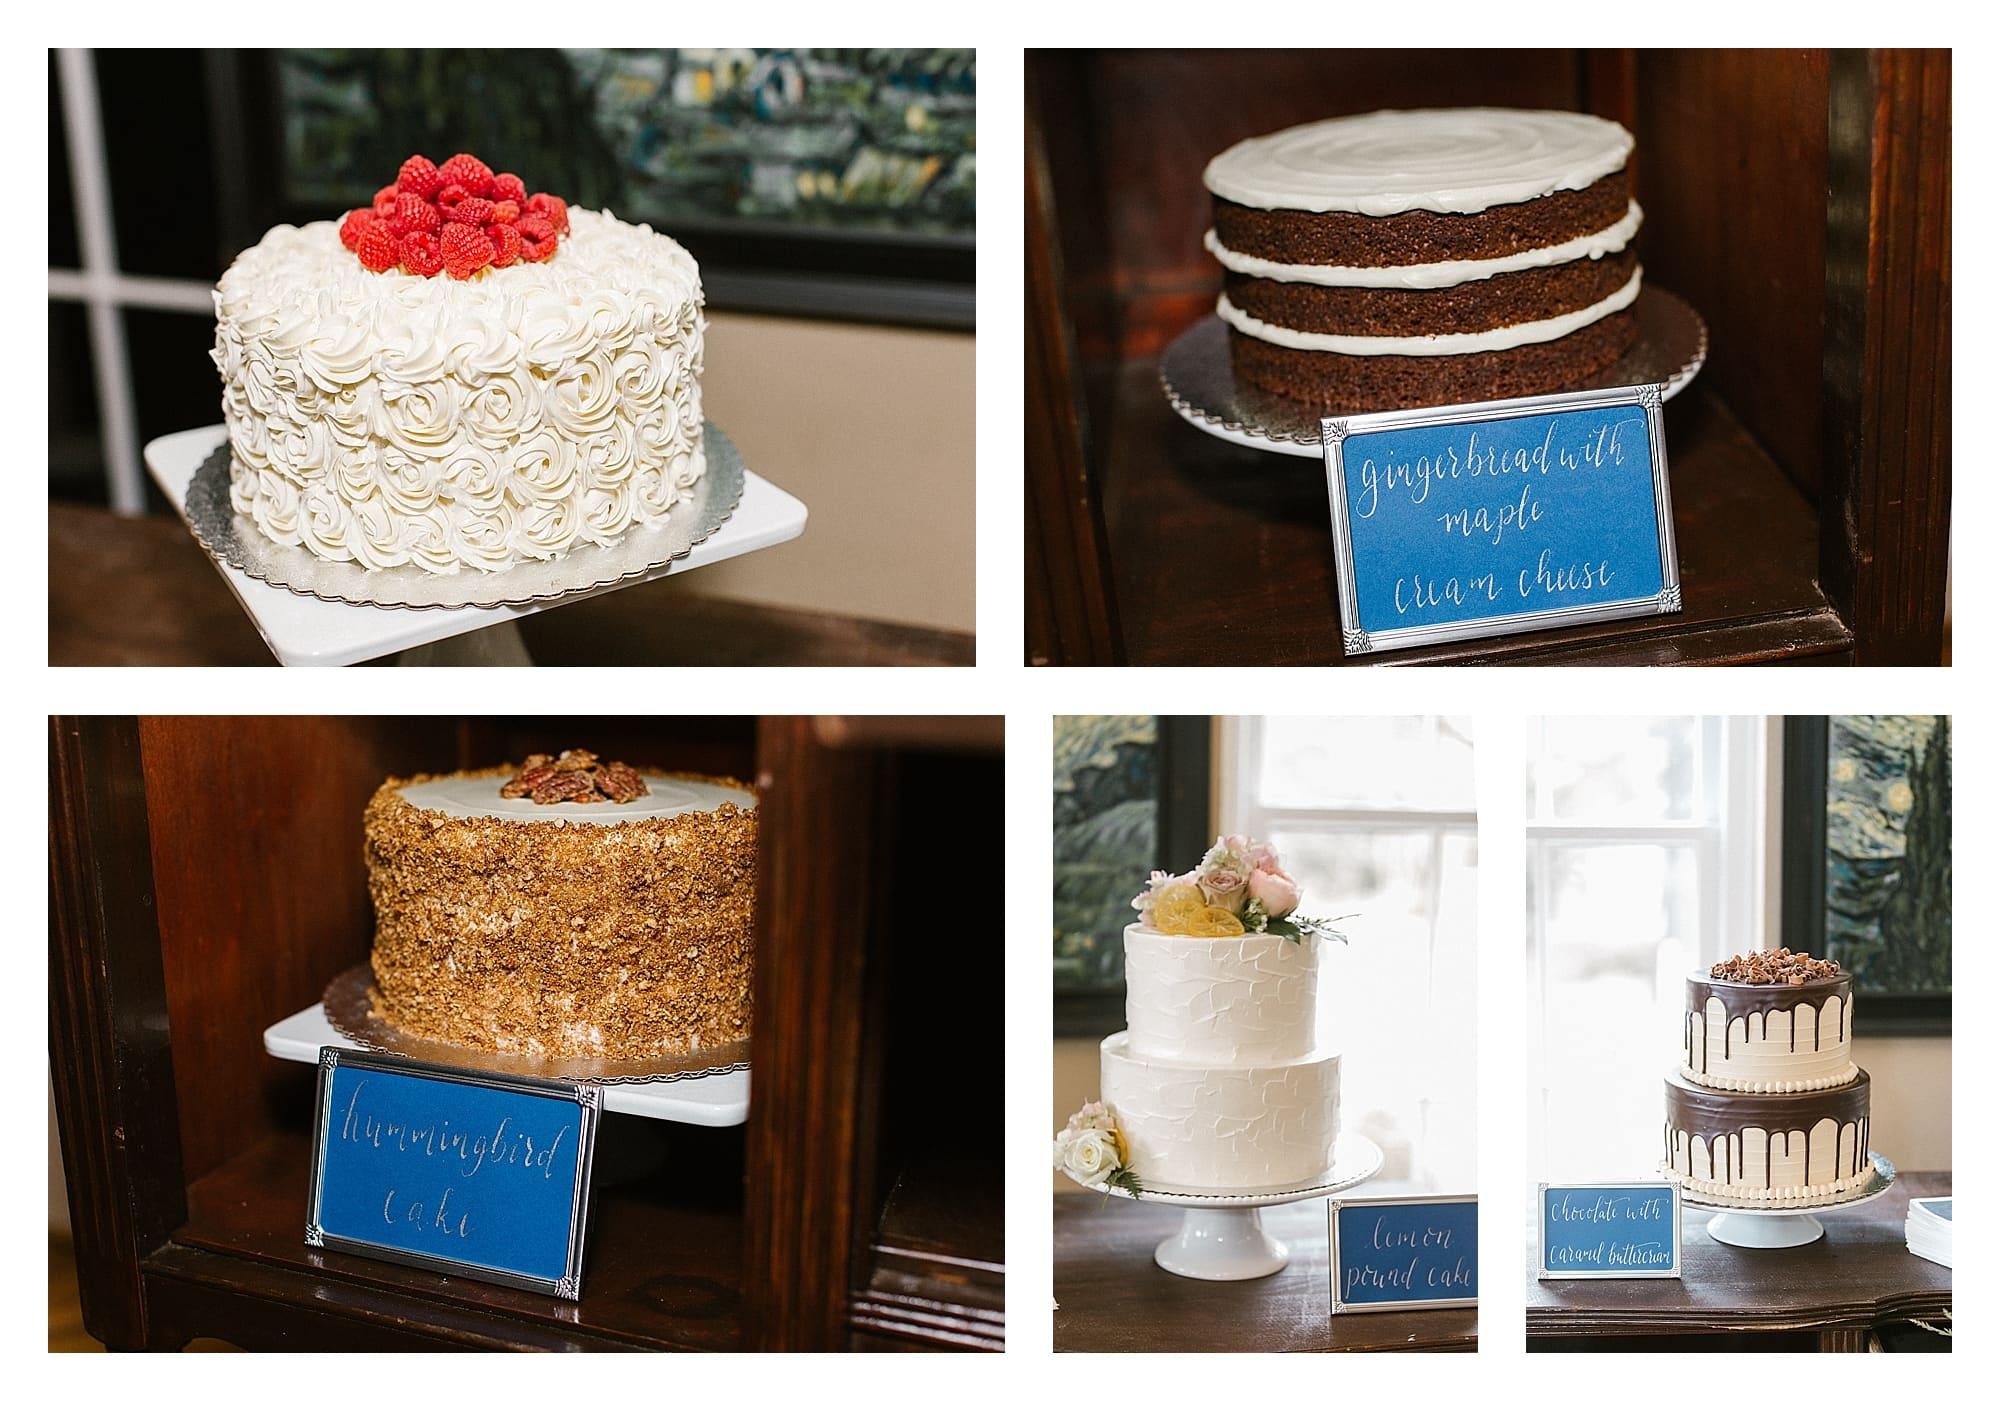 several cakes at wedding